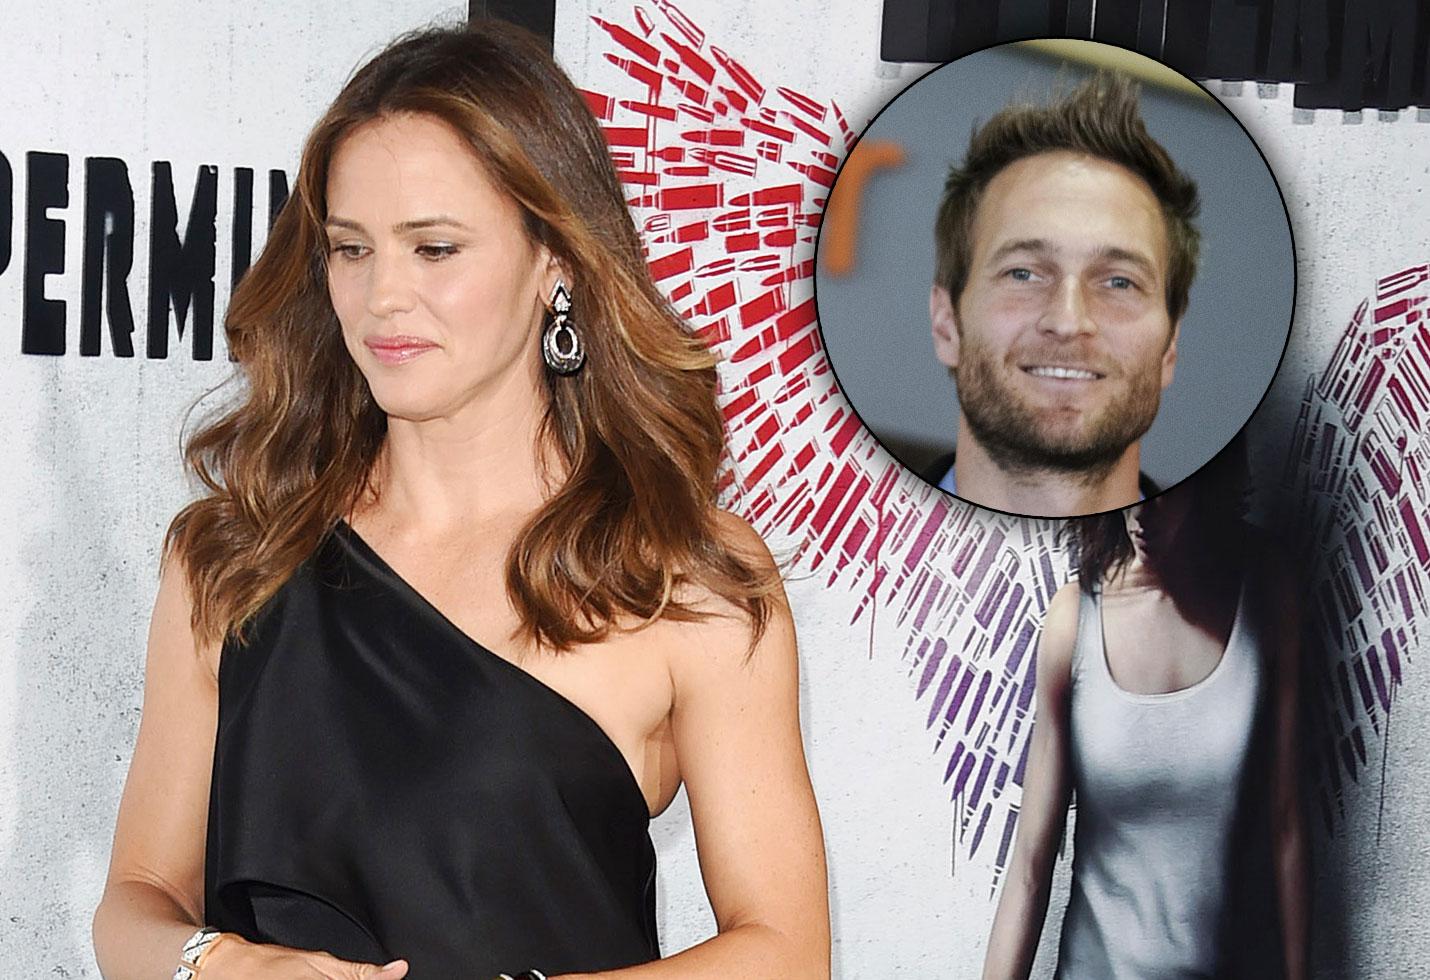 Jennifer Garner Boyfriend Divorce Custody Anger Controlling John Miller